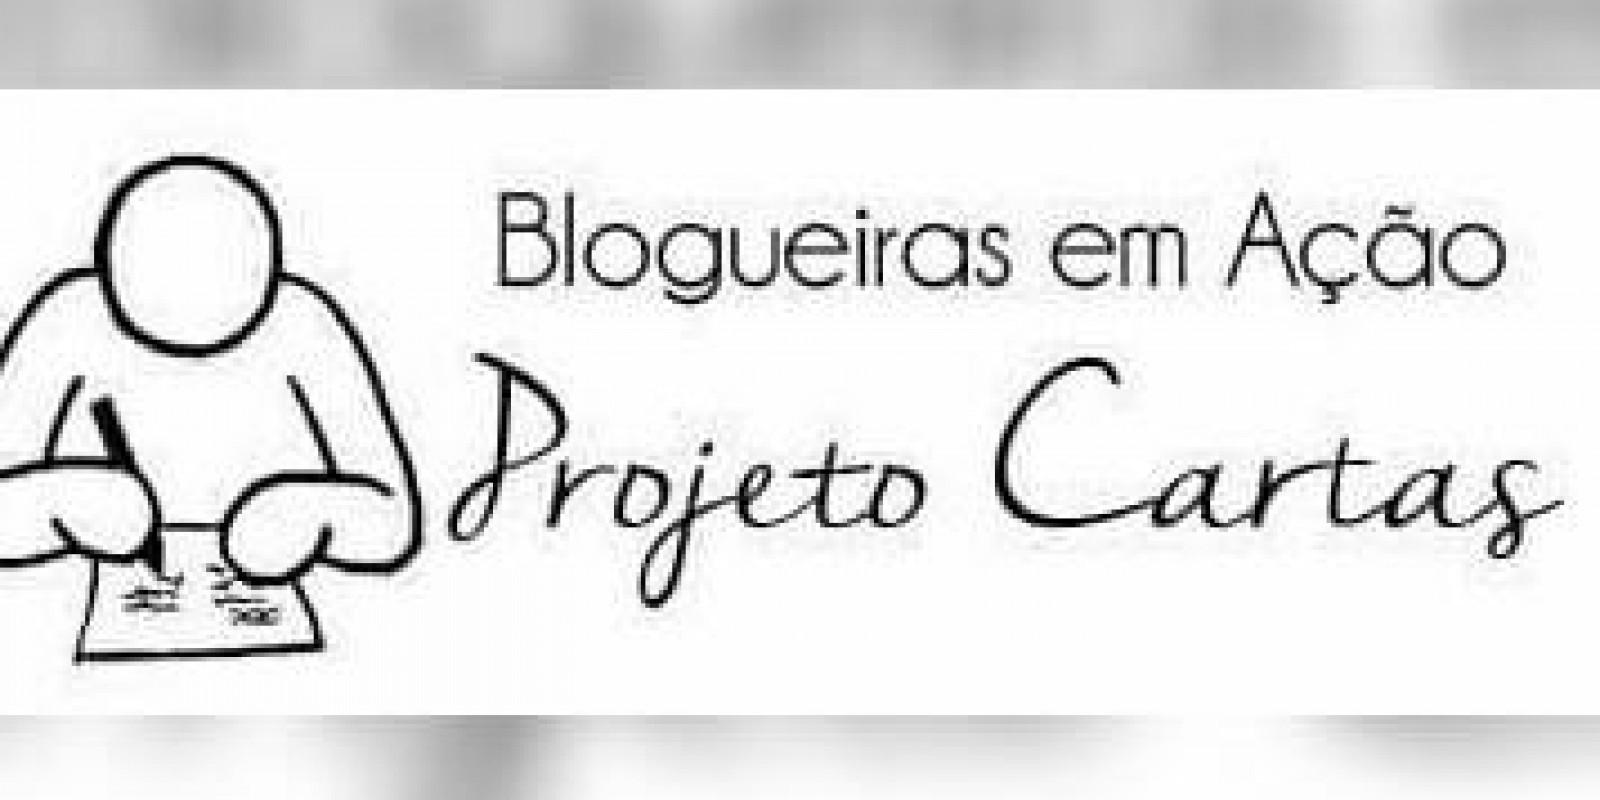 [Projeto Cartas #1: Carta a(o) autor(a)]